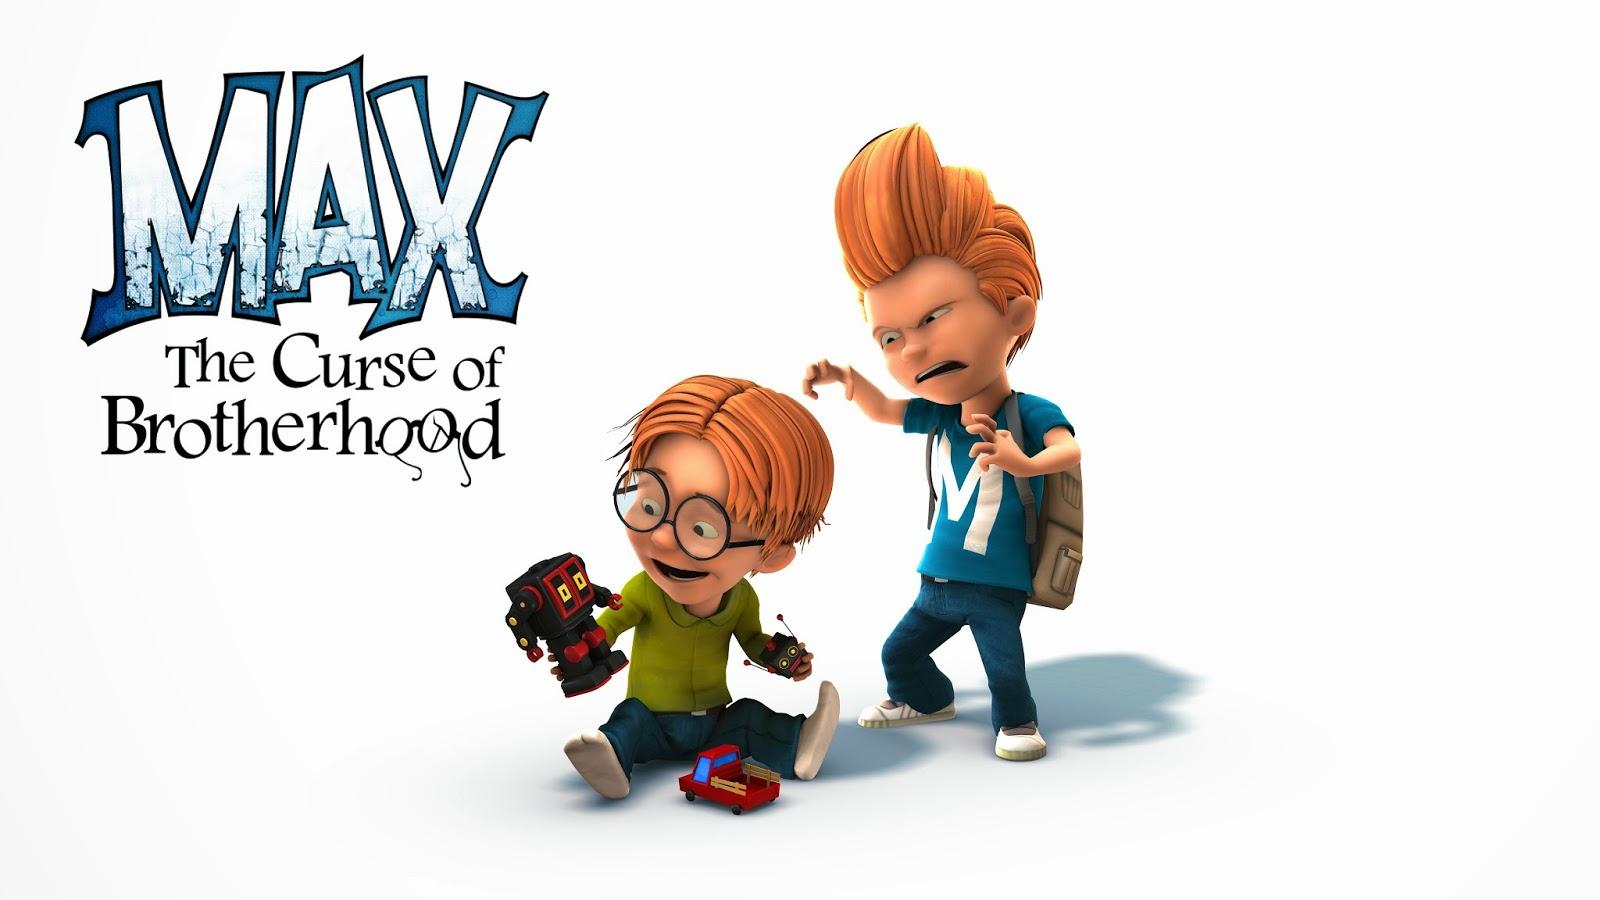 http://www.mondoxbox.com/recensione/1812/max-the-curse-of-brotherhood.html